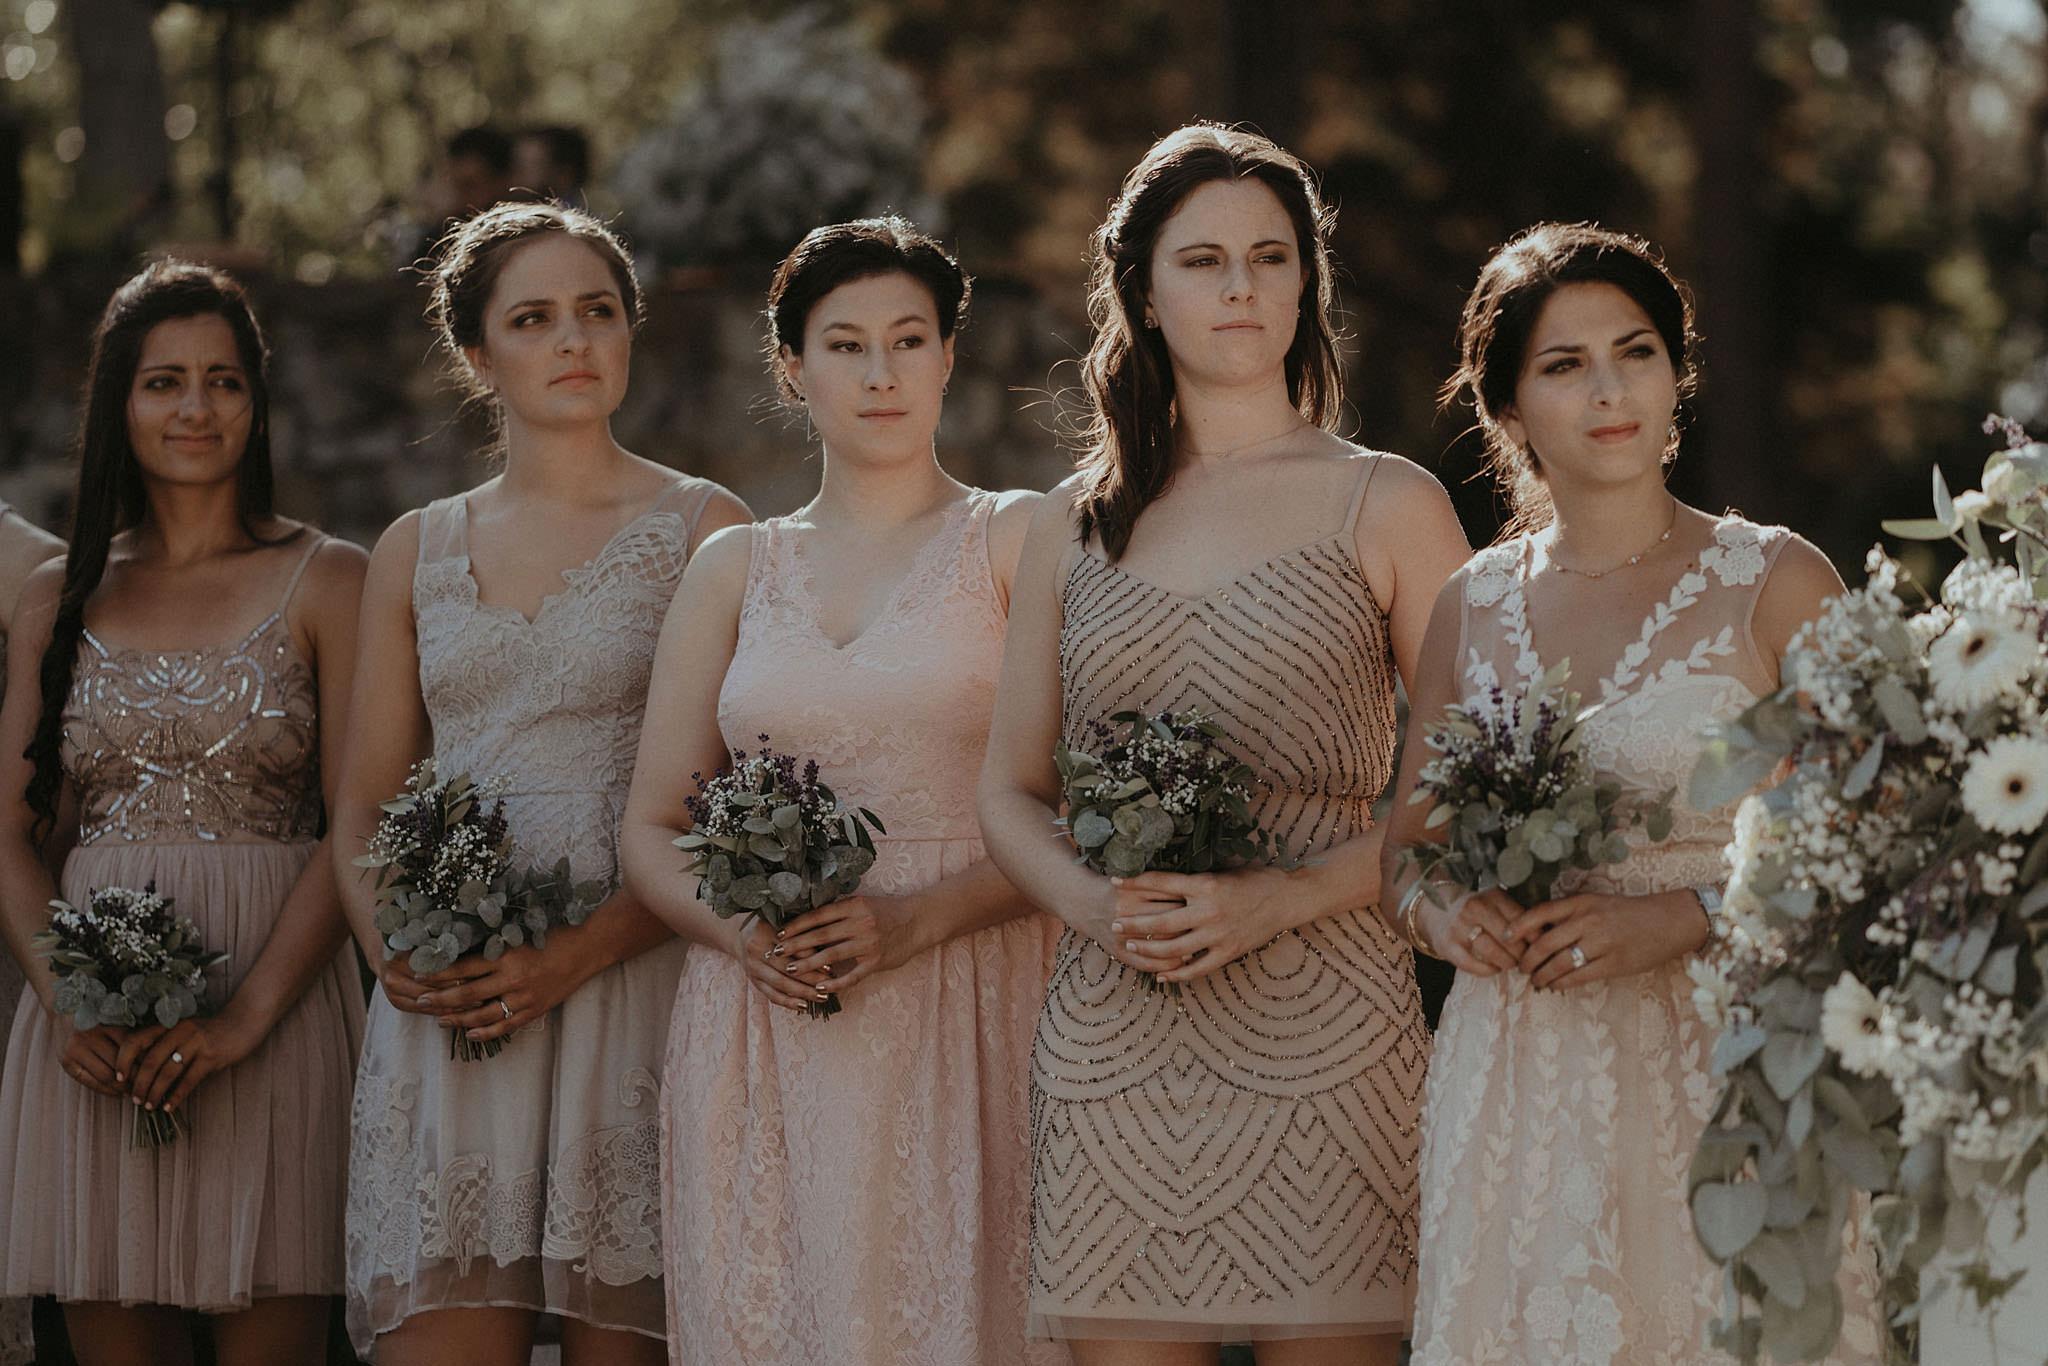 Max-Steph-Italy-Wedding-378.jpg